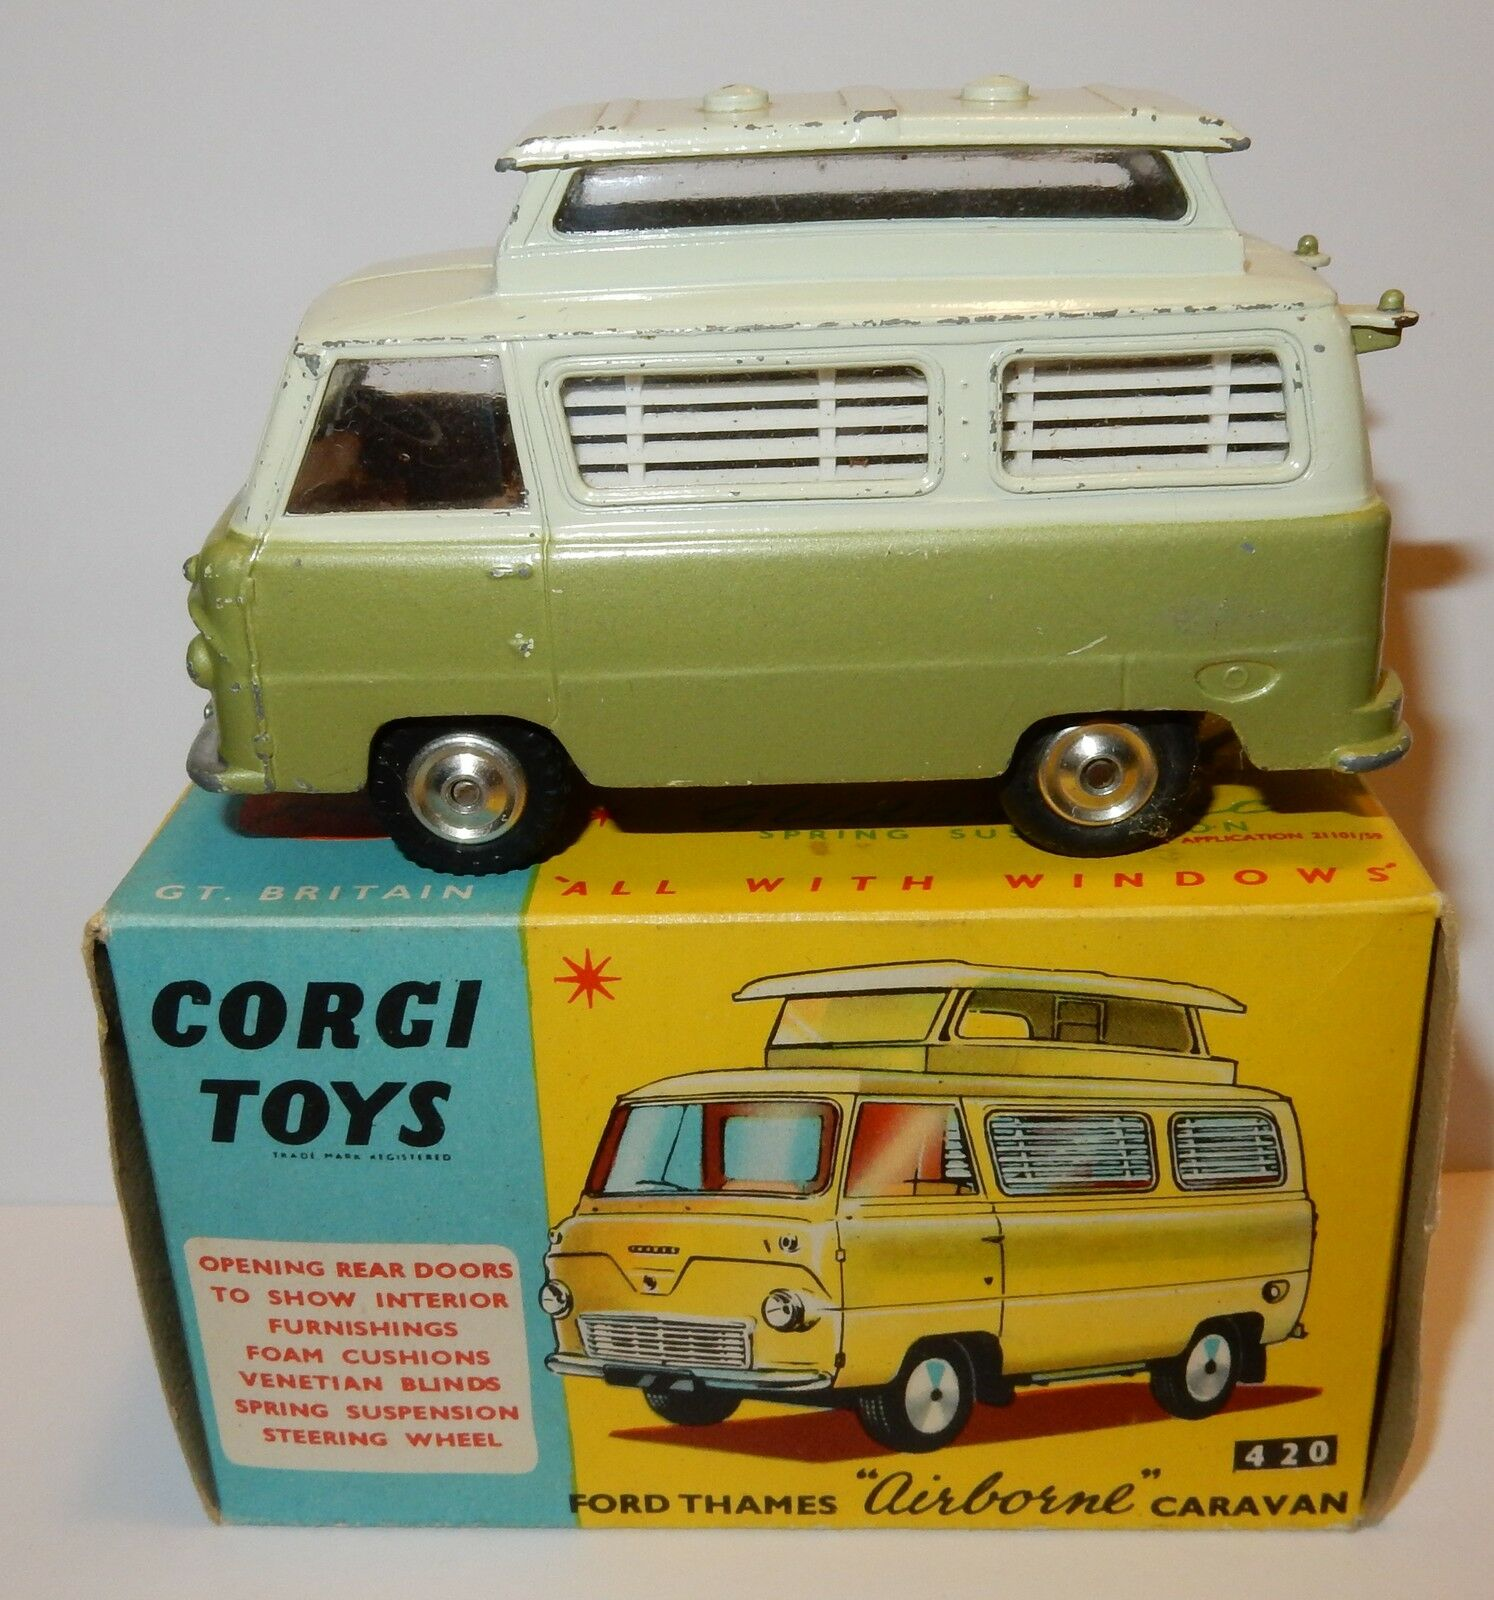 RARO CORGI TOYS FORD THAMES AIRBONE CARAVANA verde 2 TONOS 1962 1 43 REF 420 EN